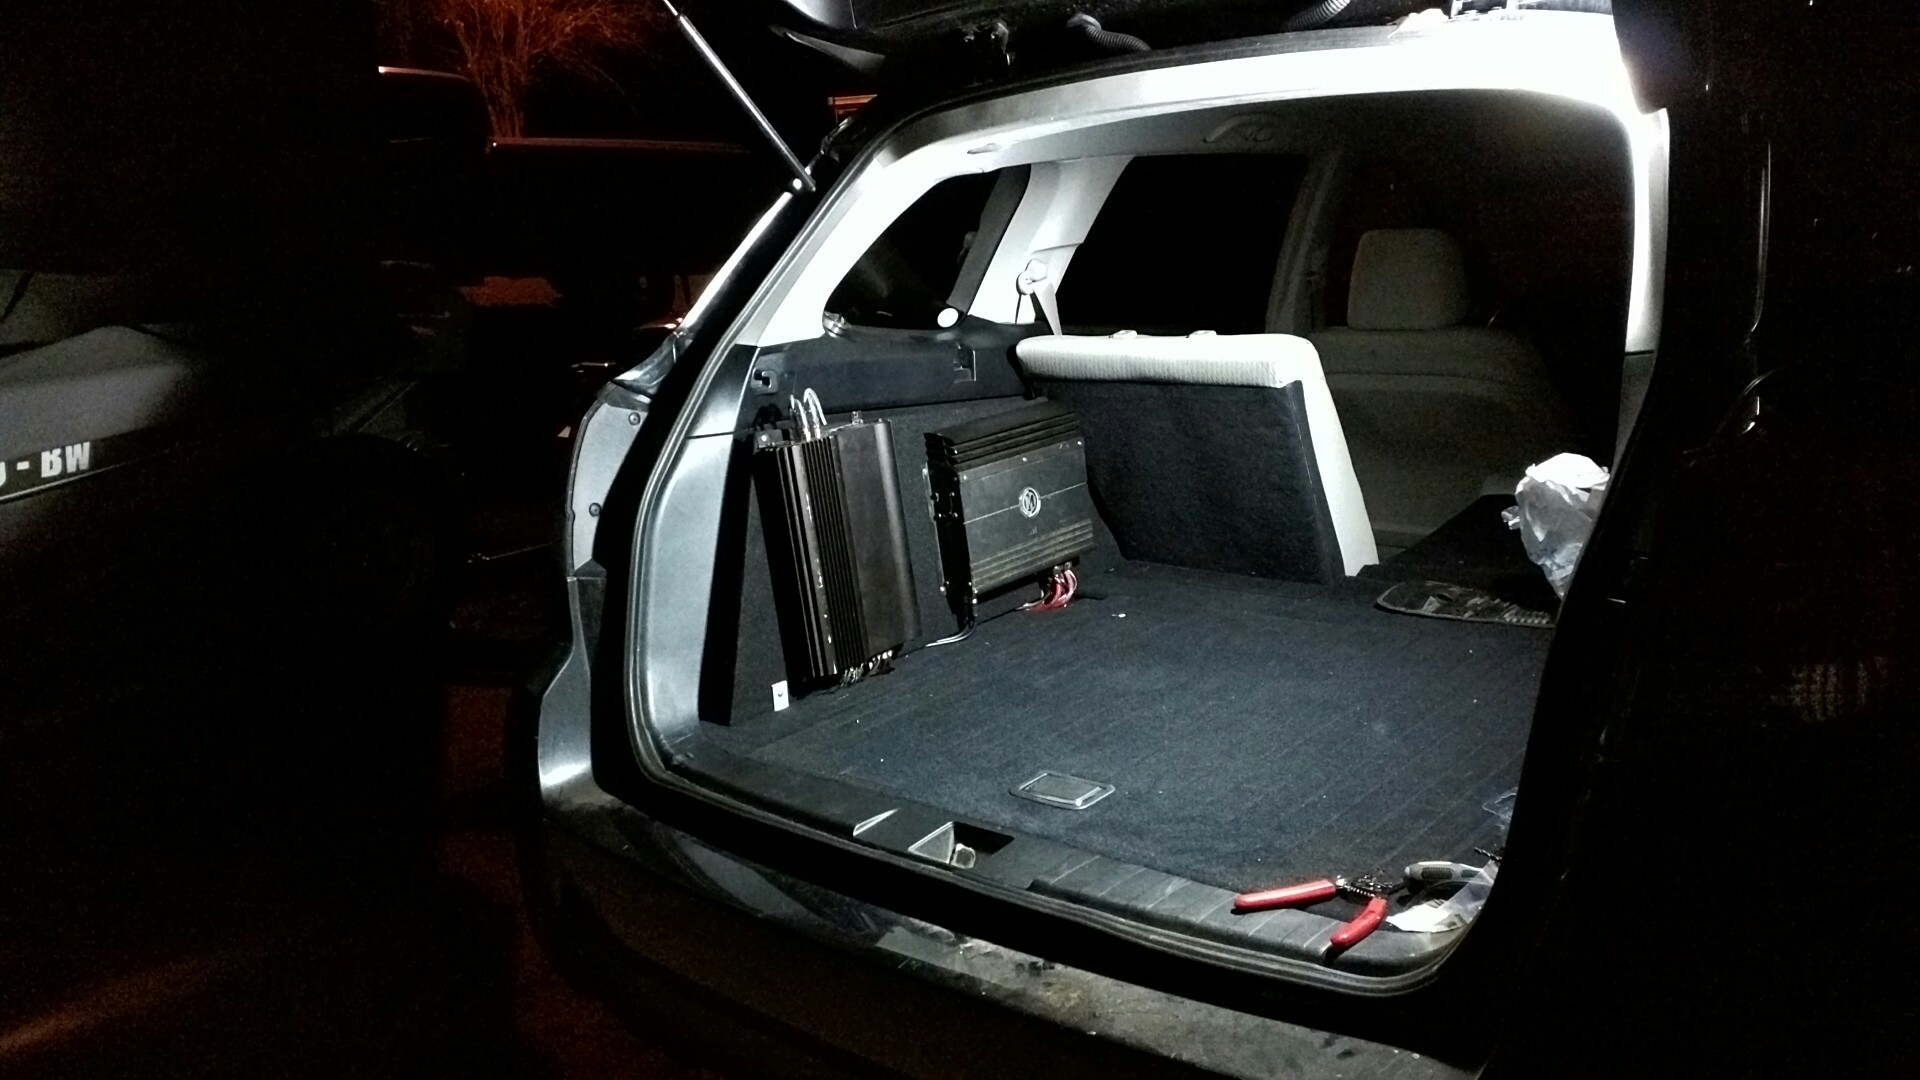 Subaru Of Dayton >> 2011 Subaru Outback audio upgrade. - Subaru Outback ...